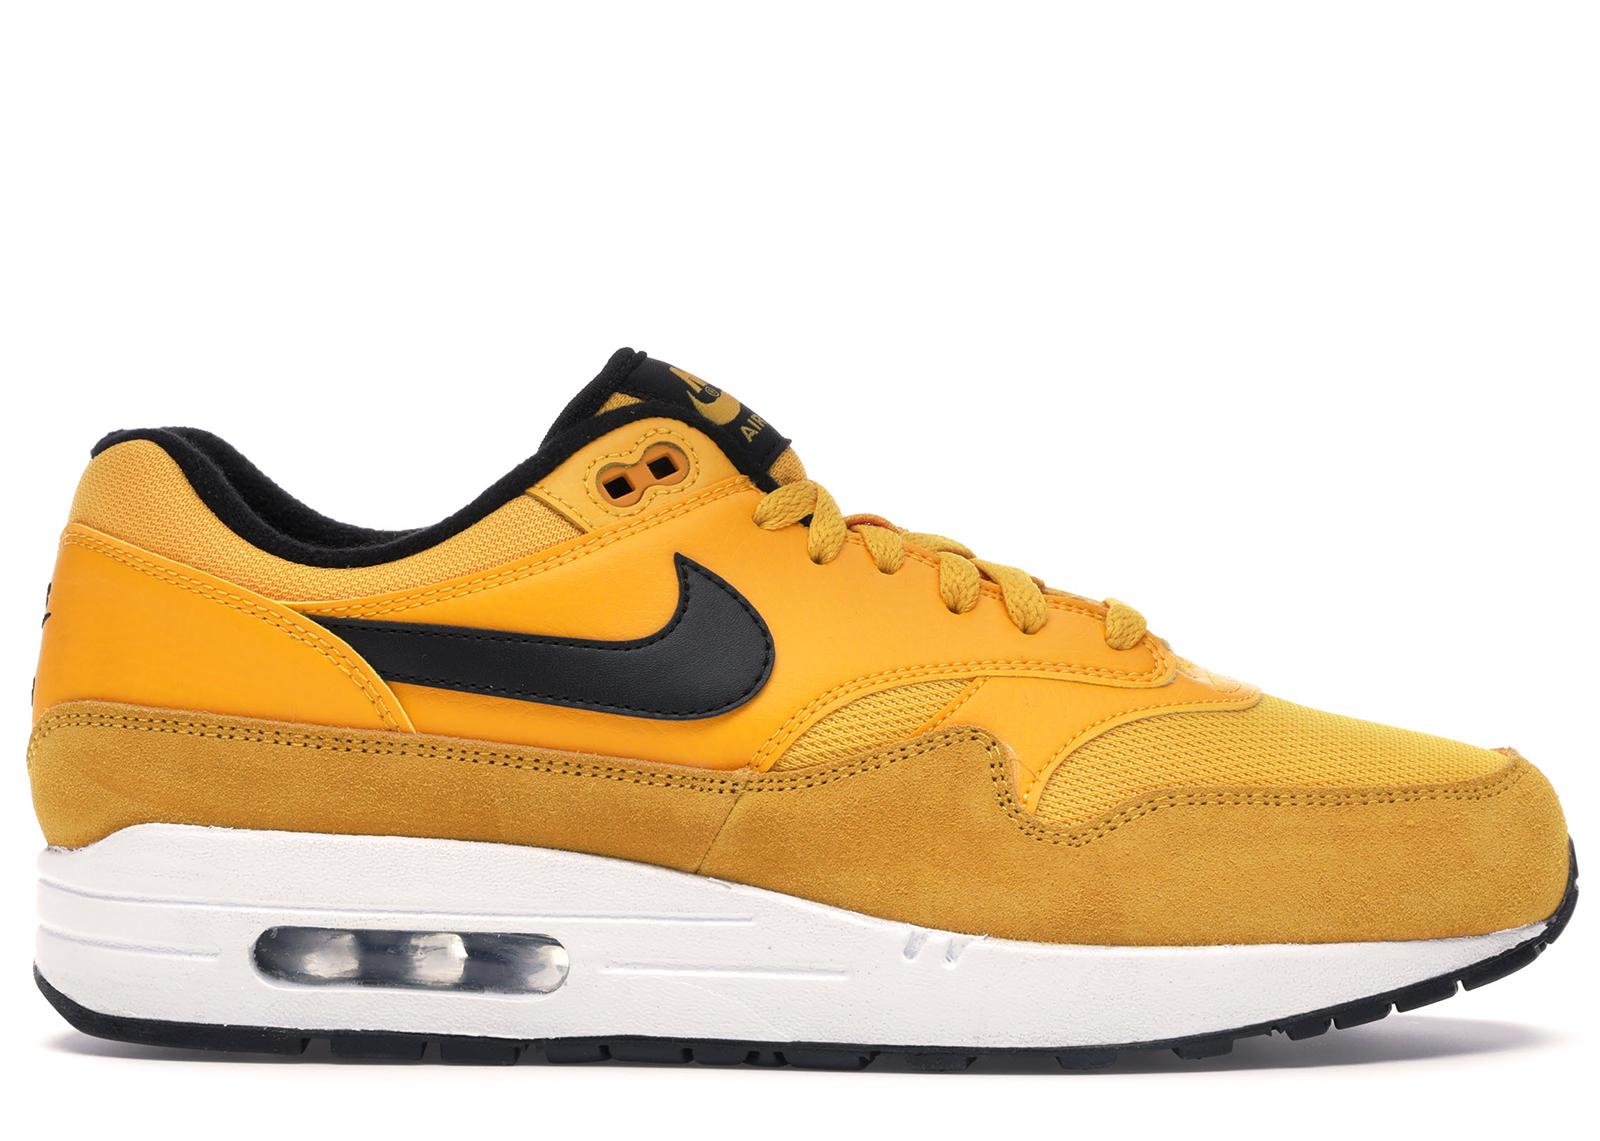 Nike Air Max 1 University Gold - BV1254-700